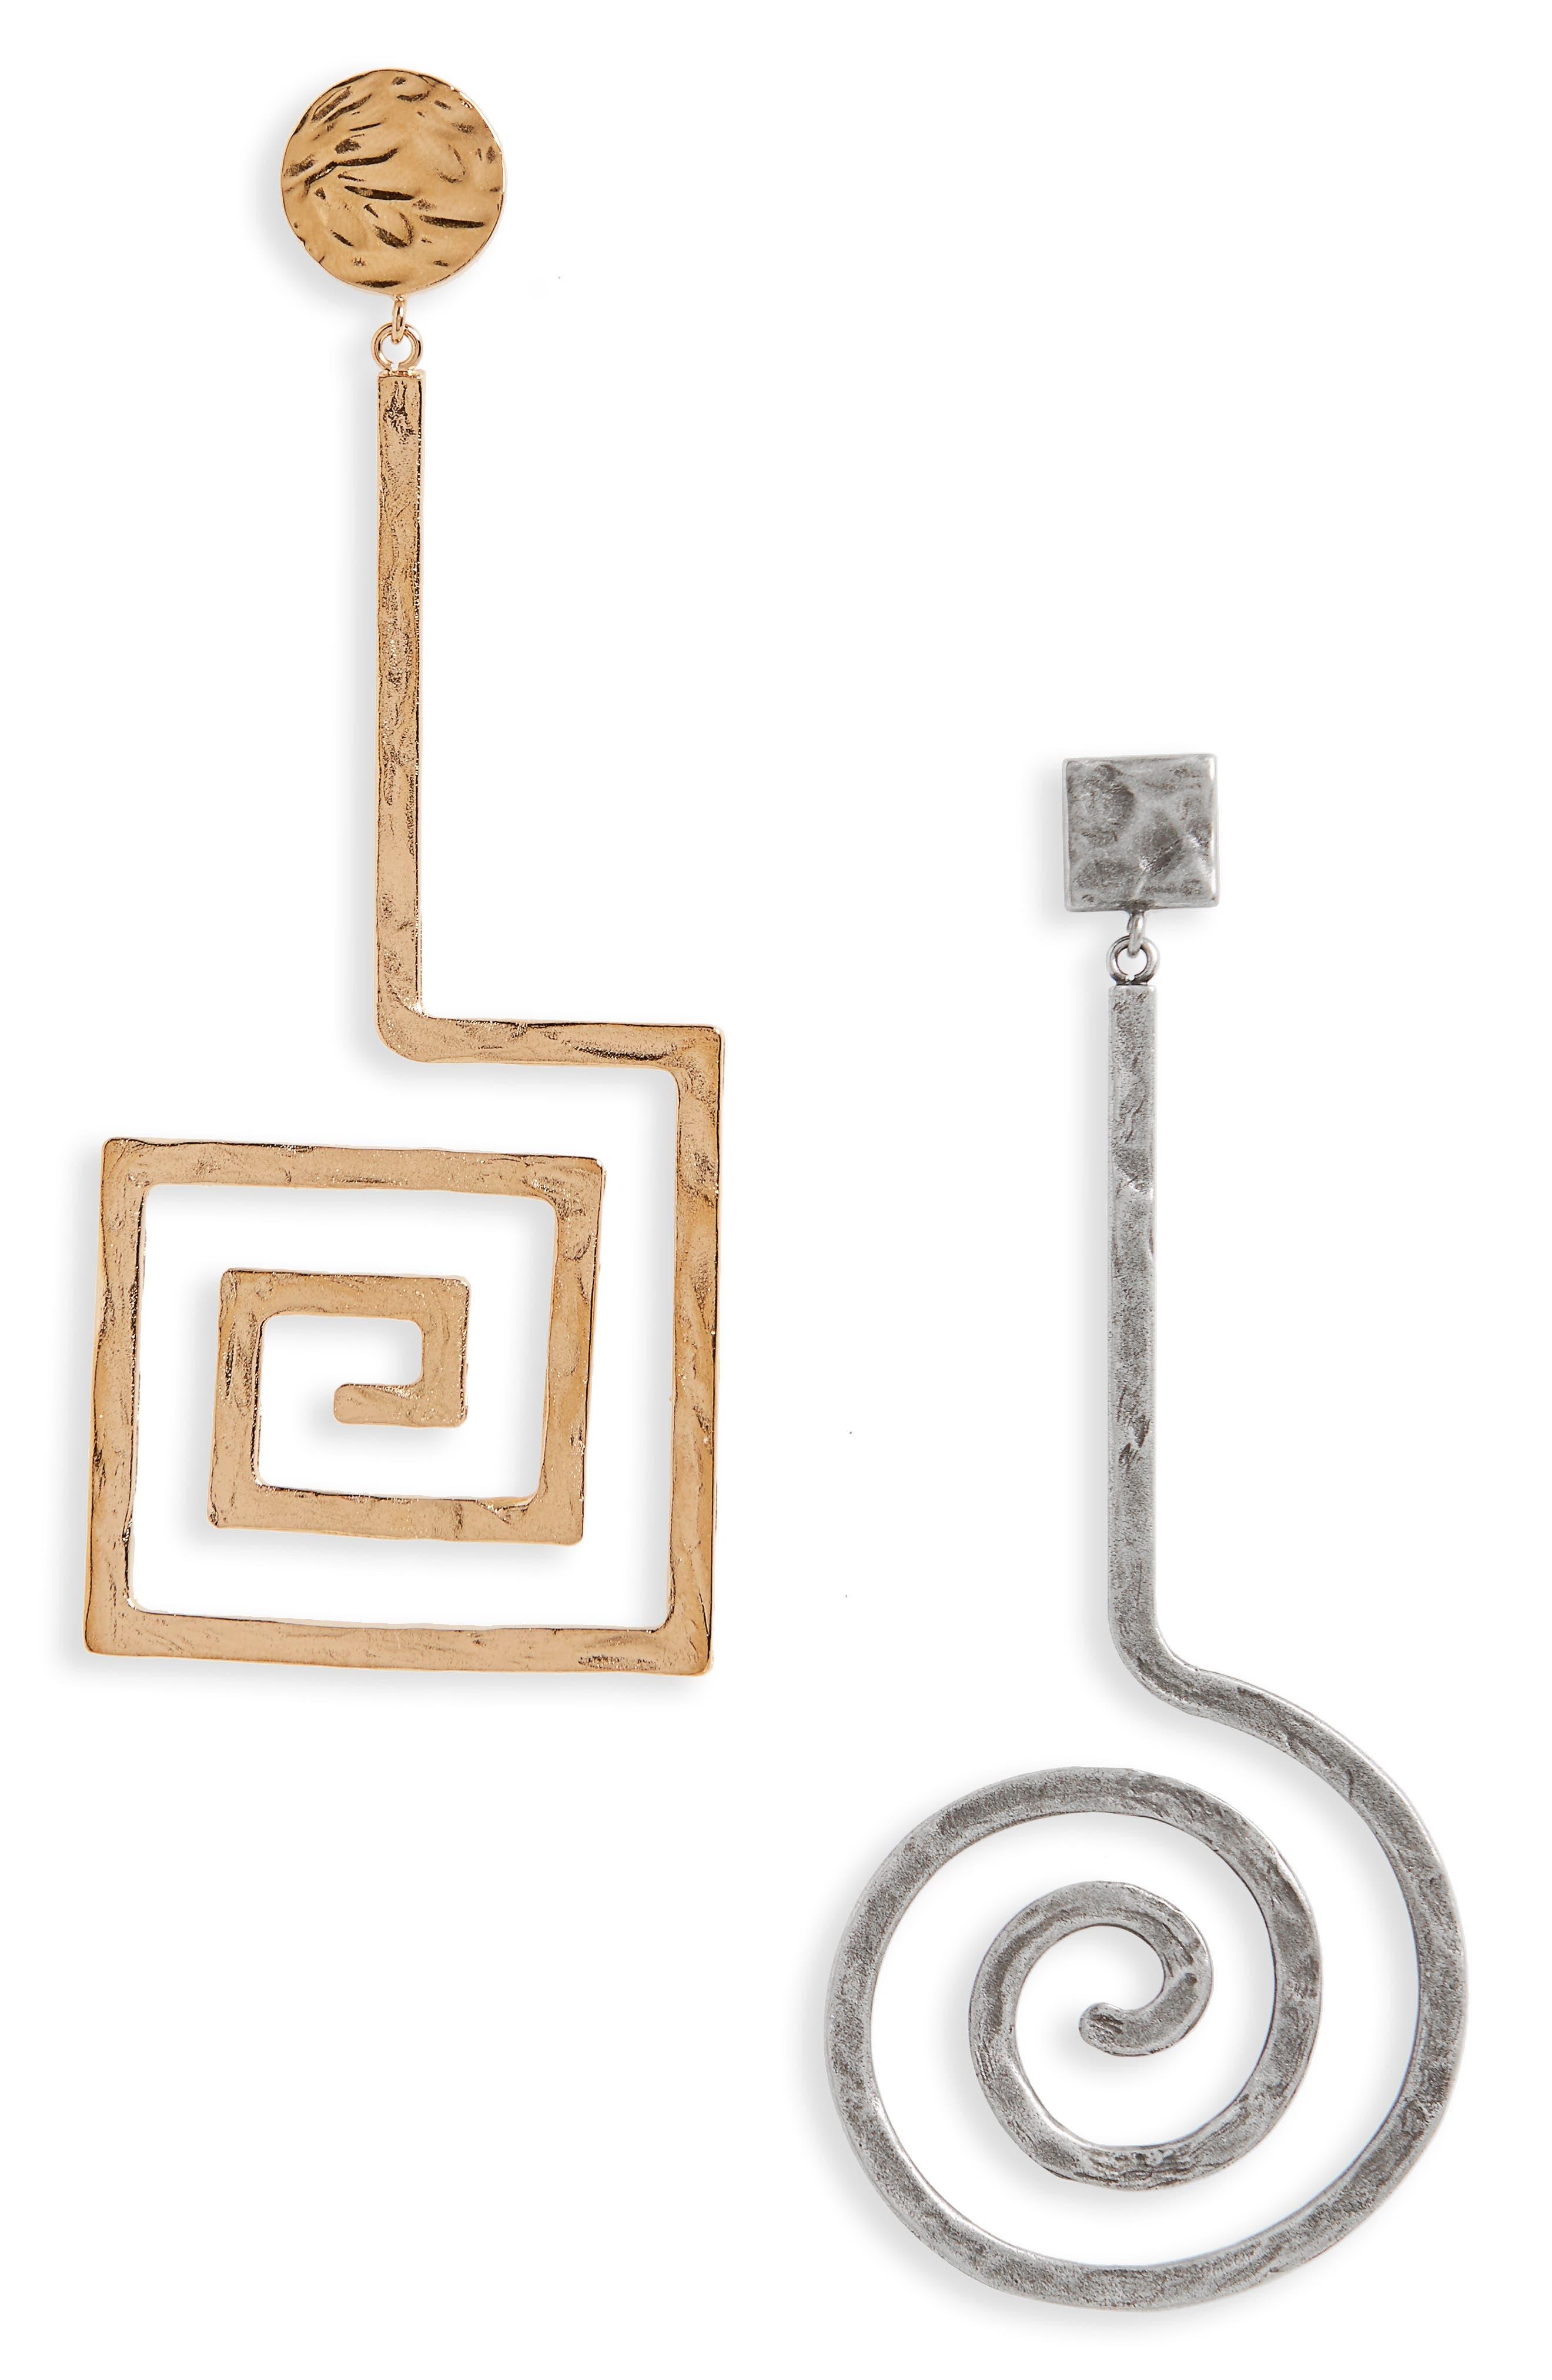 La Spirale Mismatched Statement Earrings,                             Main thumbnail 1, color,                             Gold/ Silver